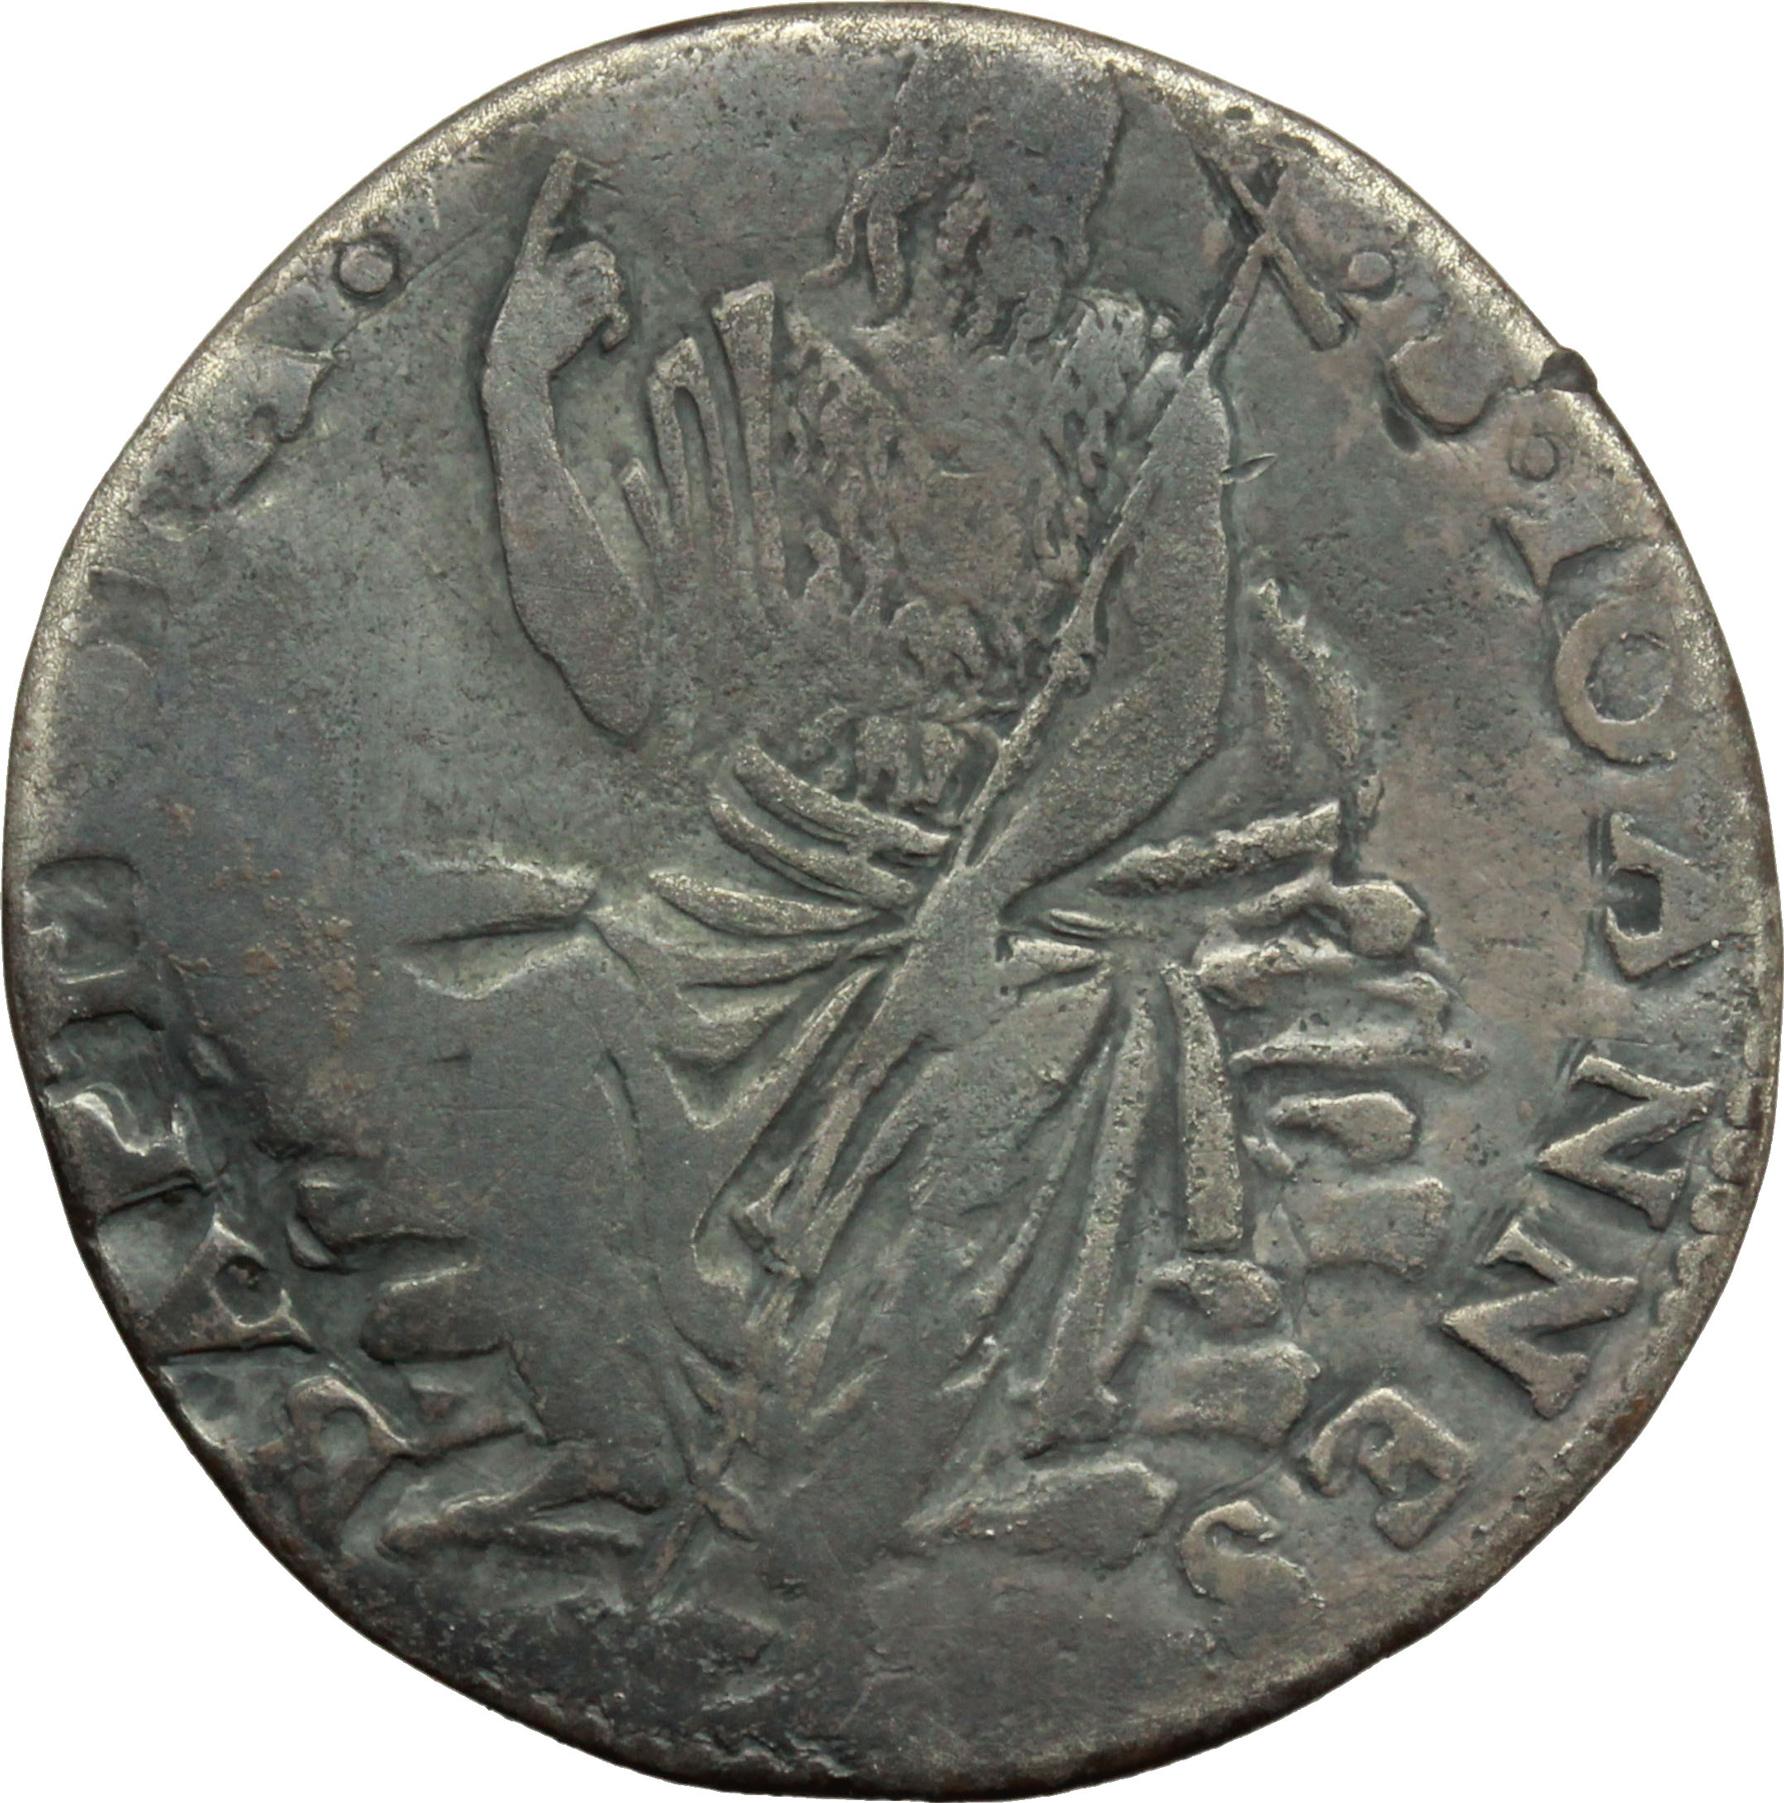 Asta numismatica 37e artemide aste 519 firenze for Coin firenze